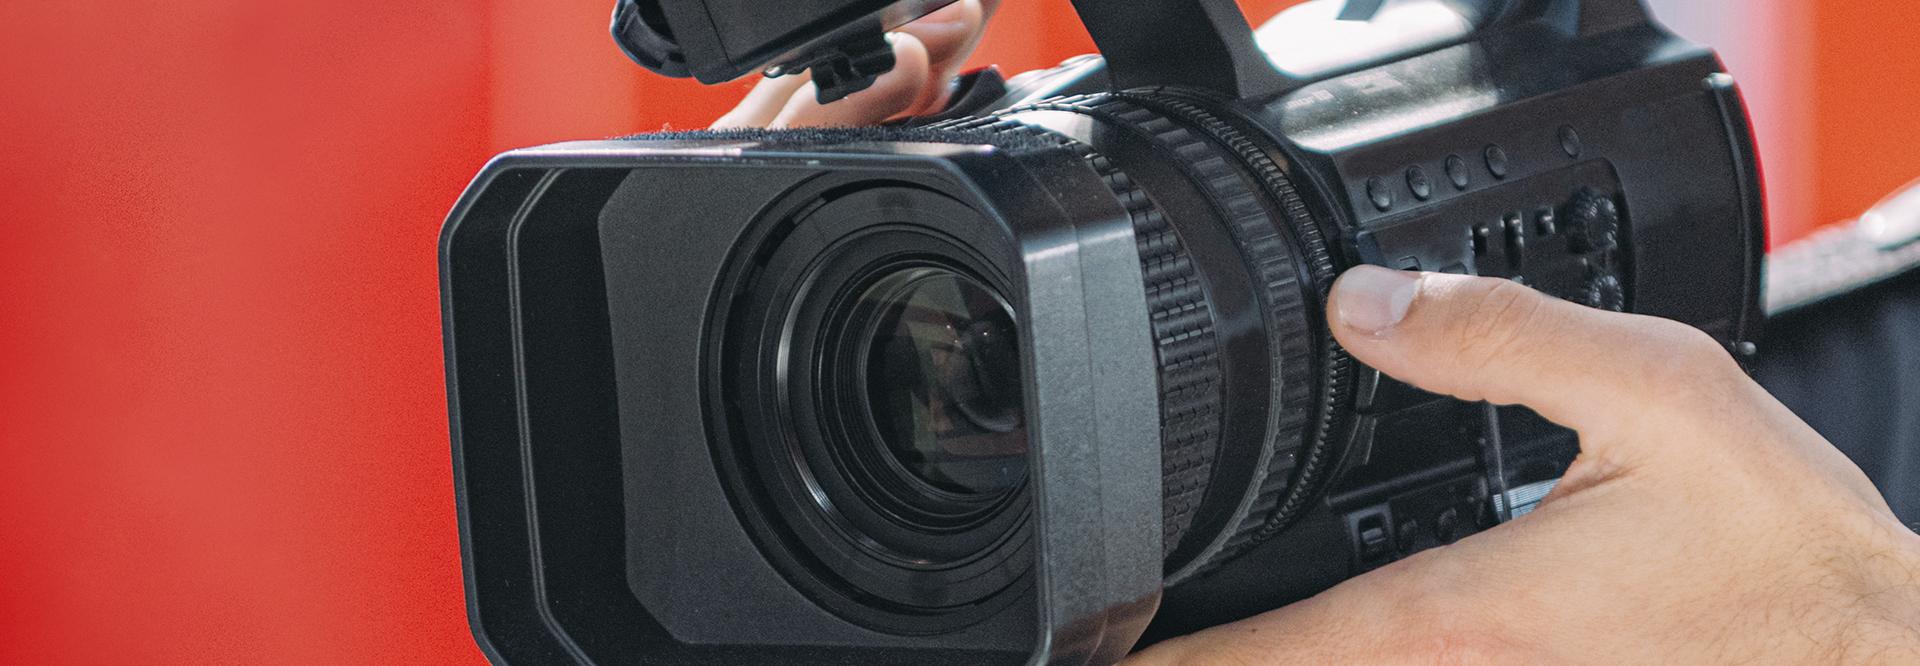 Estrategia de comunicación videos audiovisuales para planes de comunicacion grupoaudiovisual 02